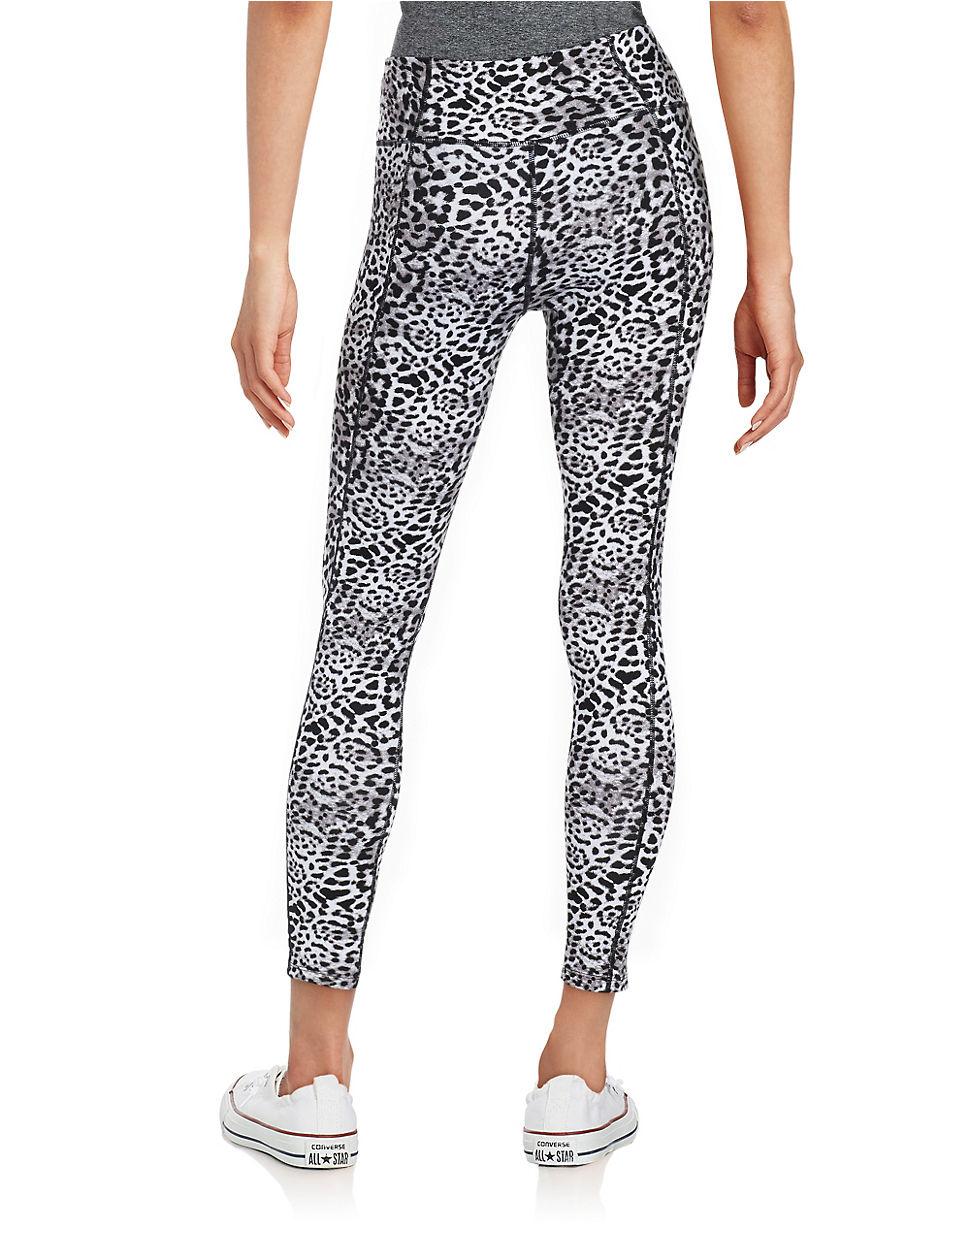 1f531c211f70 Betsey Johnson Animal Print Athletic Pants in Black - Lyst